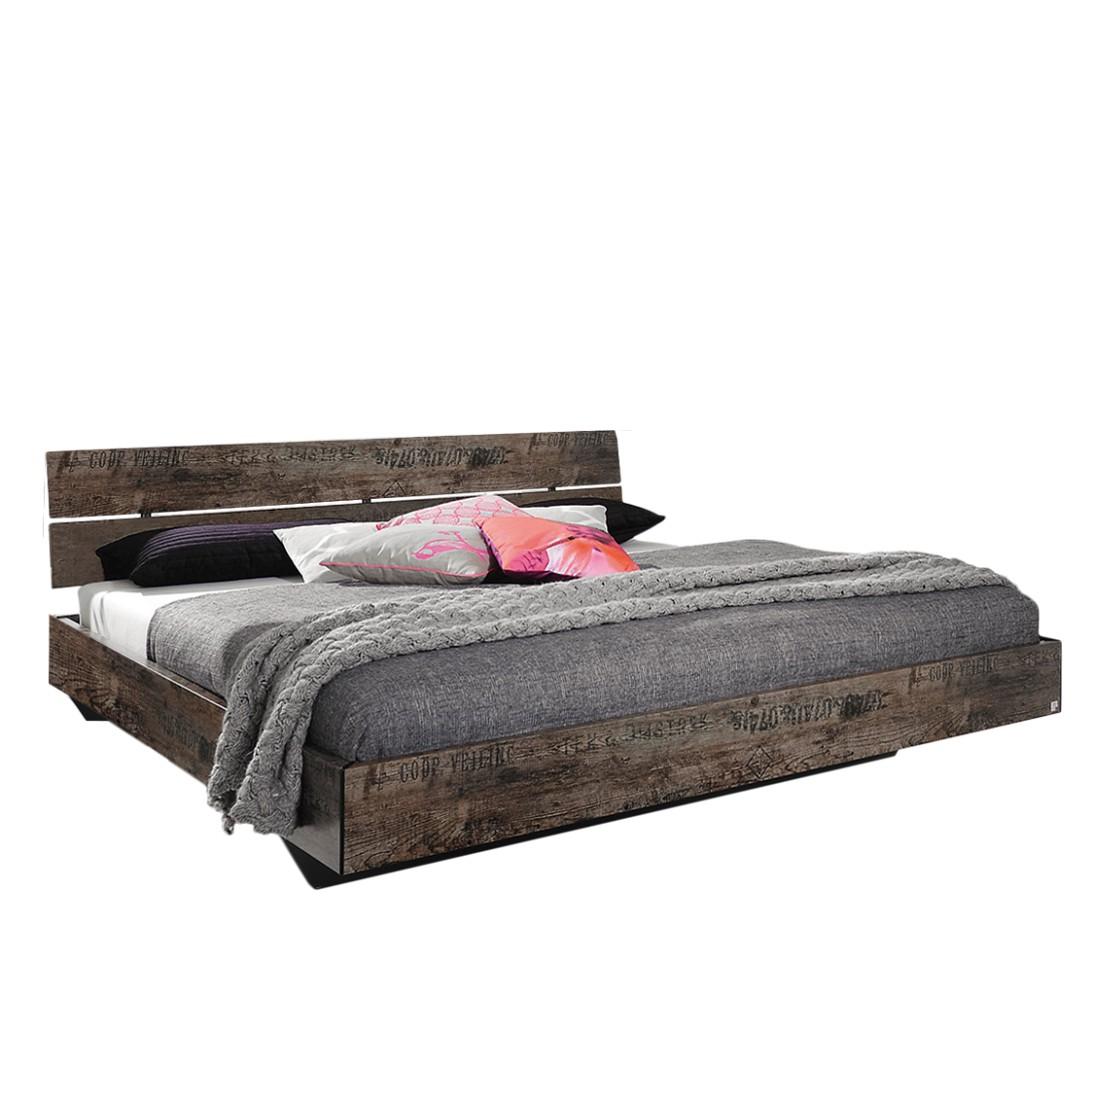 Lit futon Sumatra - 140 x 200cm - Marron vintage, Rauch Select